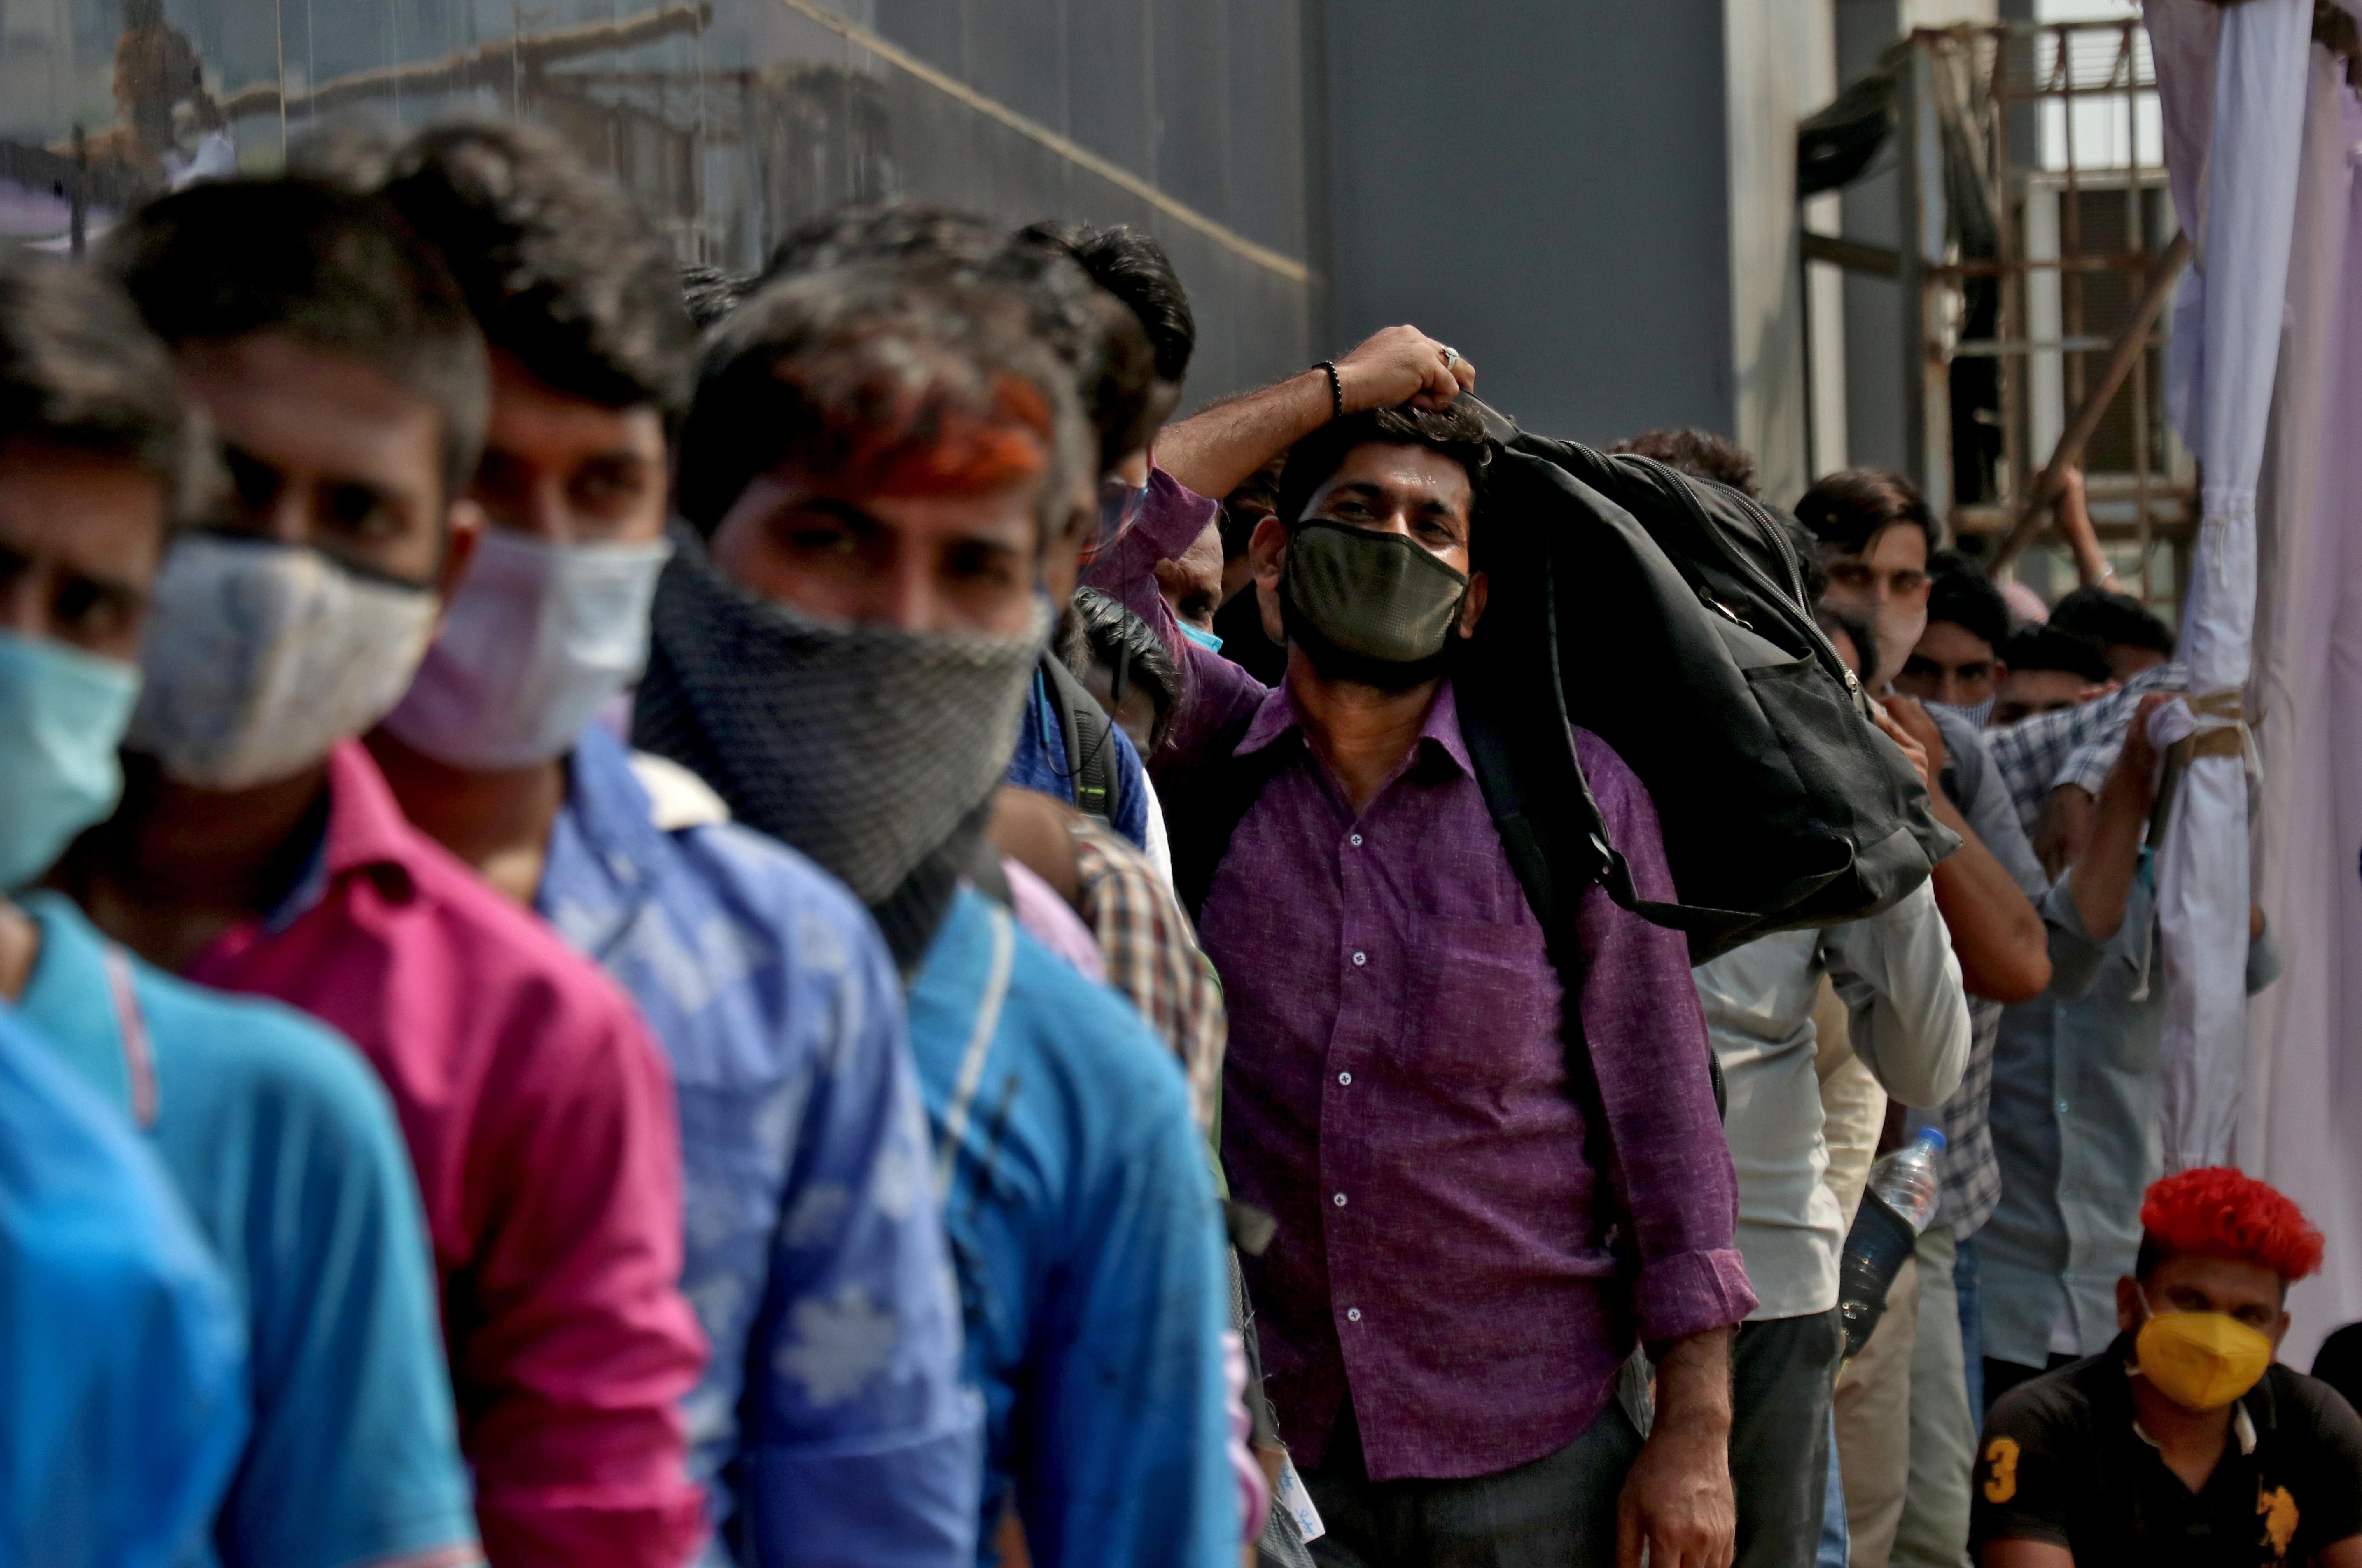 People wait in a line to enter the Lokmanya Tilak Terminus railway station, amid the spread of the coronavirus disease (COVID-19) in Mumbai, India, April 12, 2021. REUTERS/Niharika Kulkarni